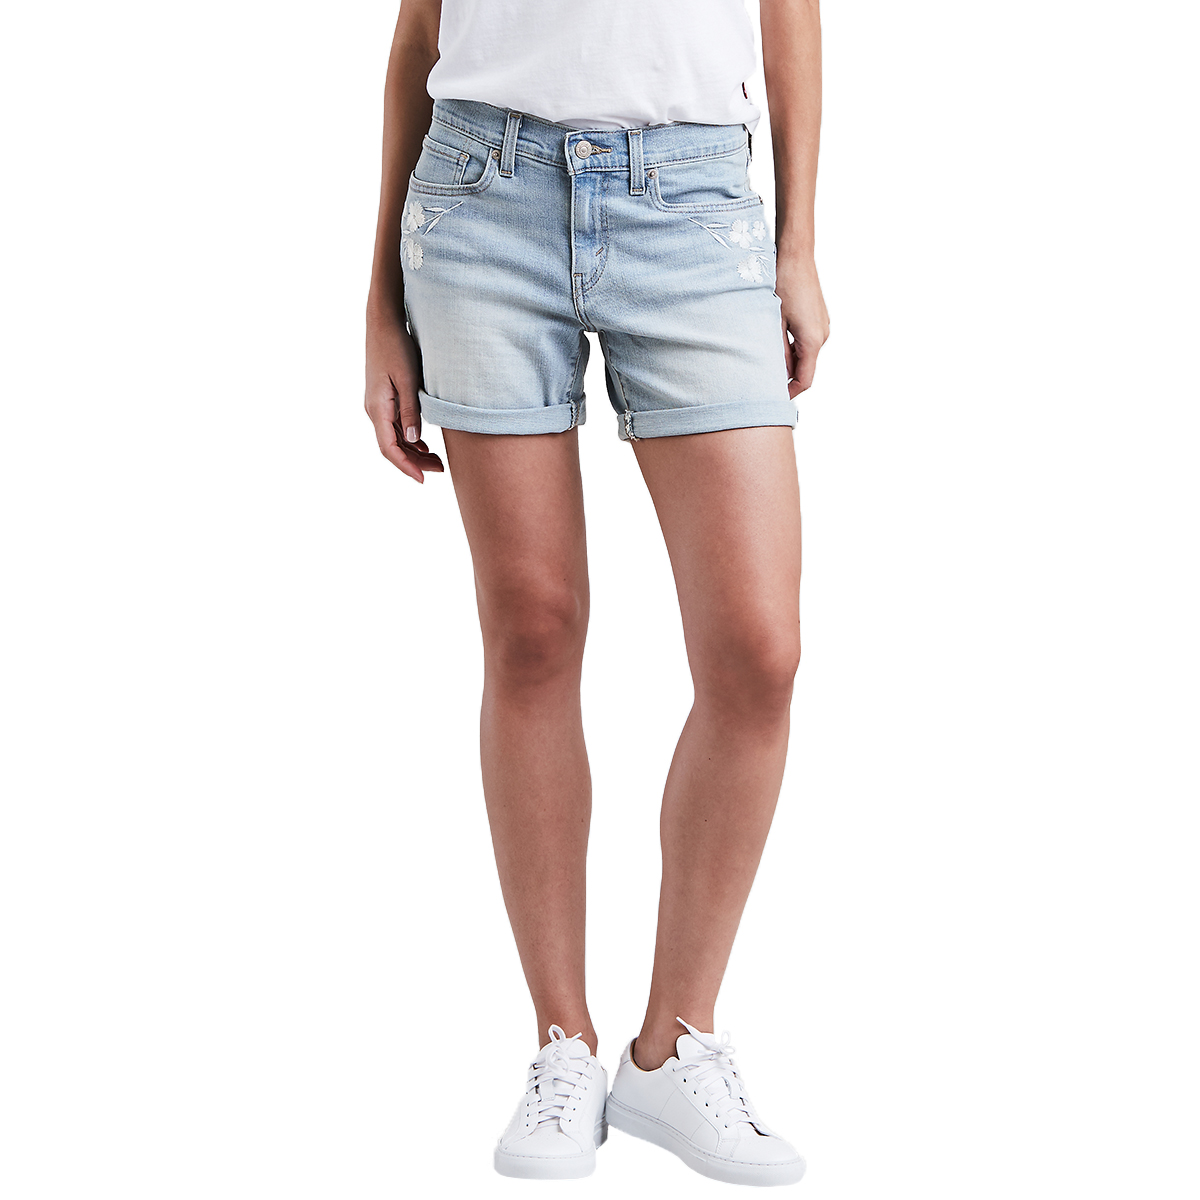 Levi's Women's Classic Shorts - Blue, 28